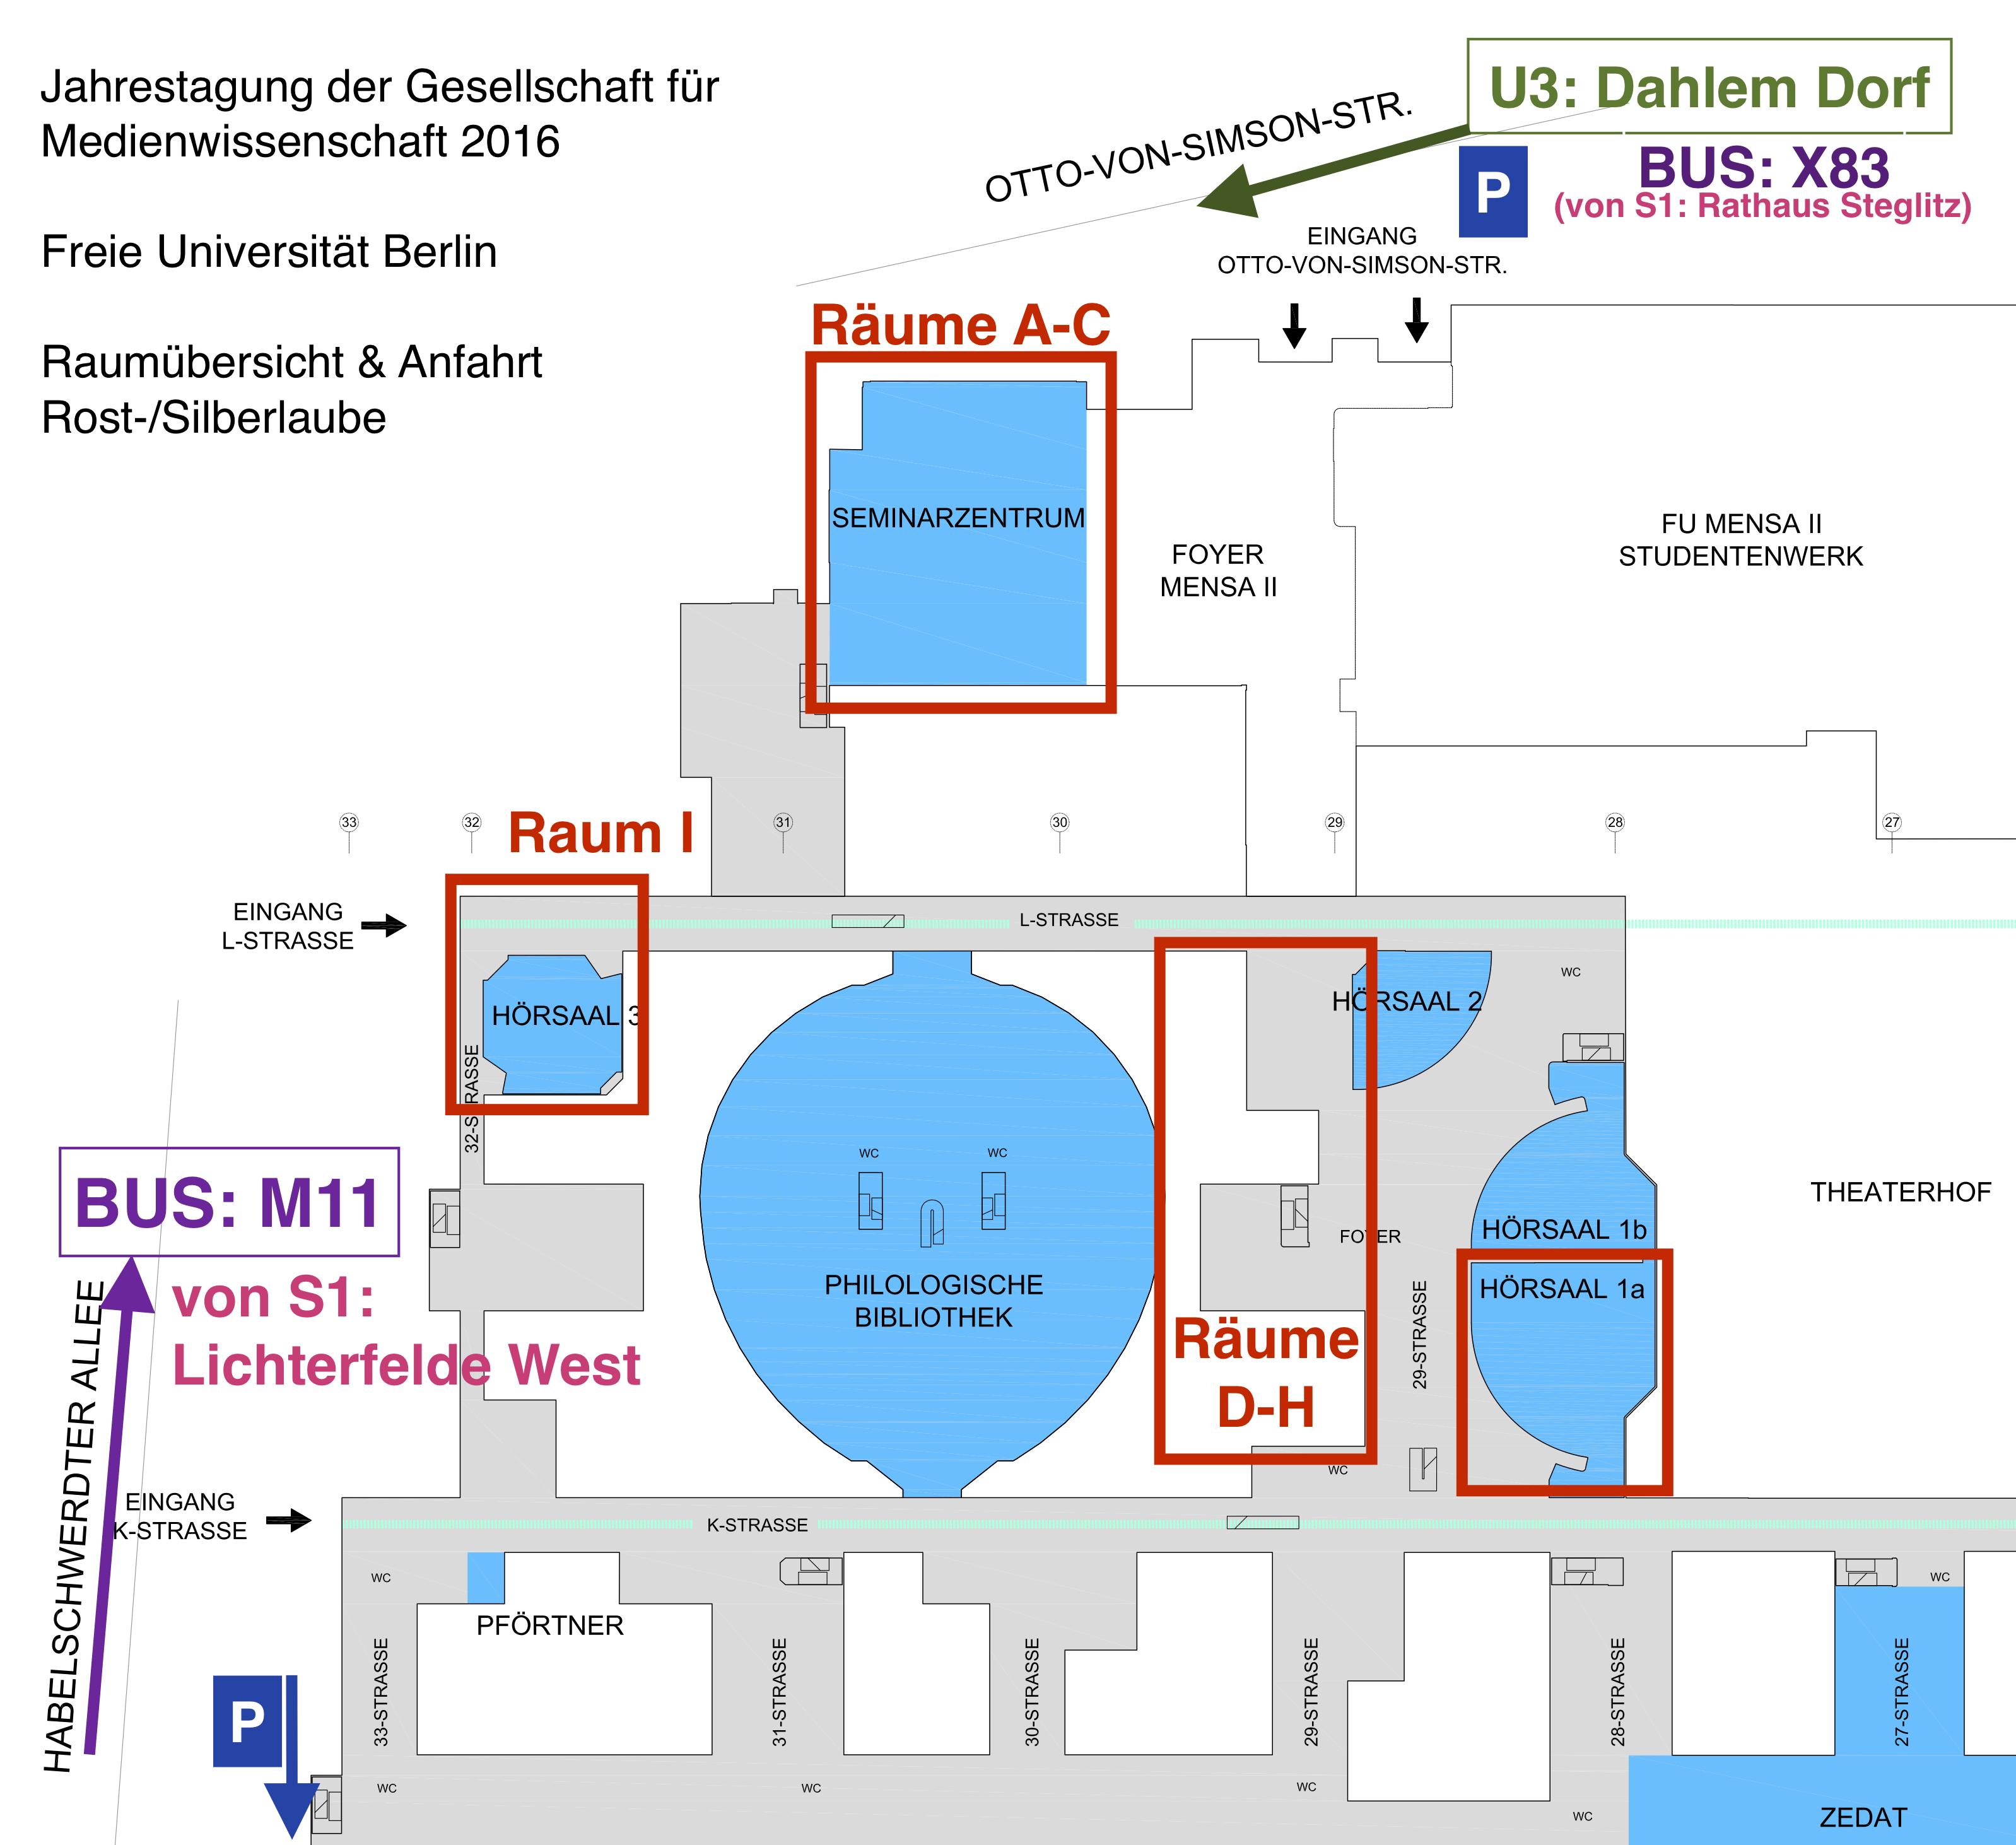 Kino Oranienburg Programm